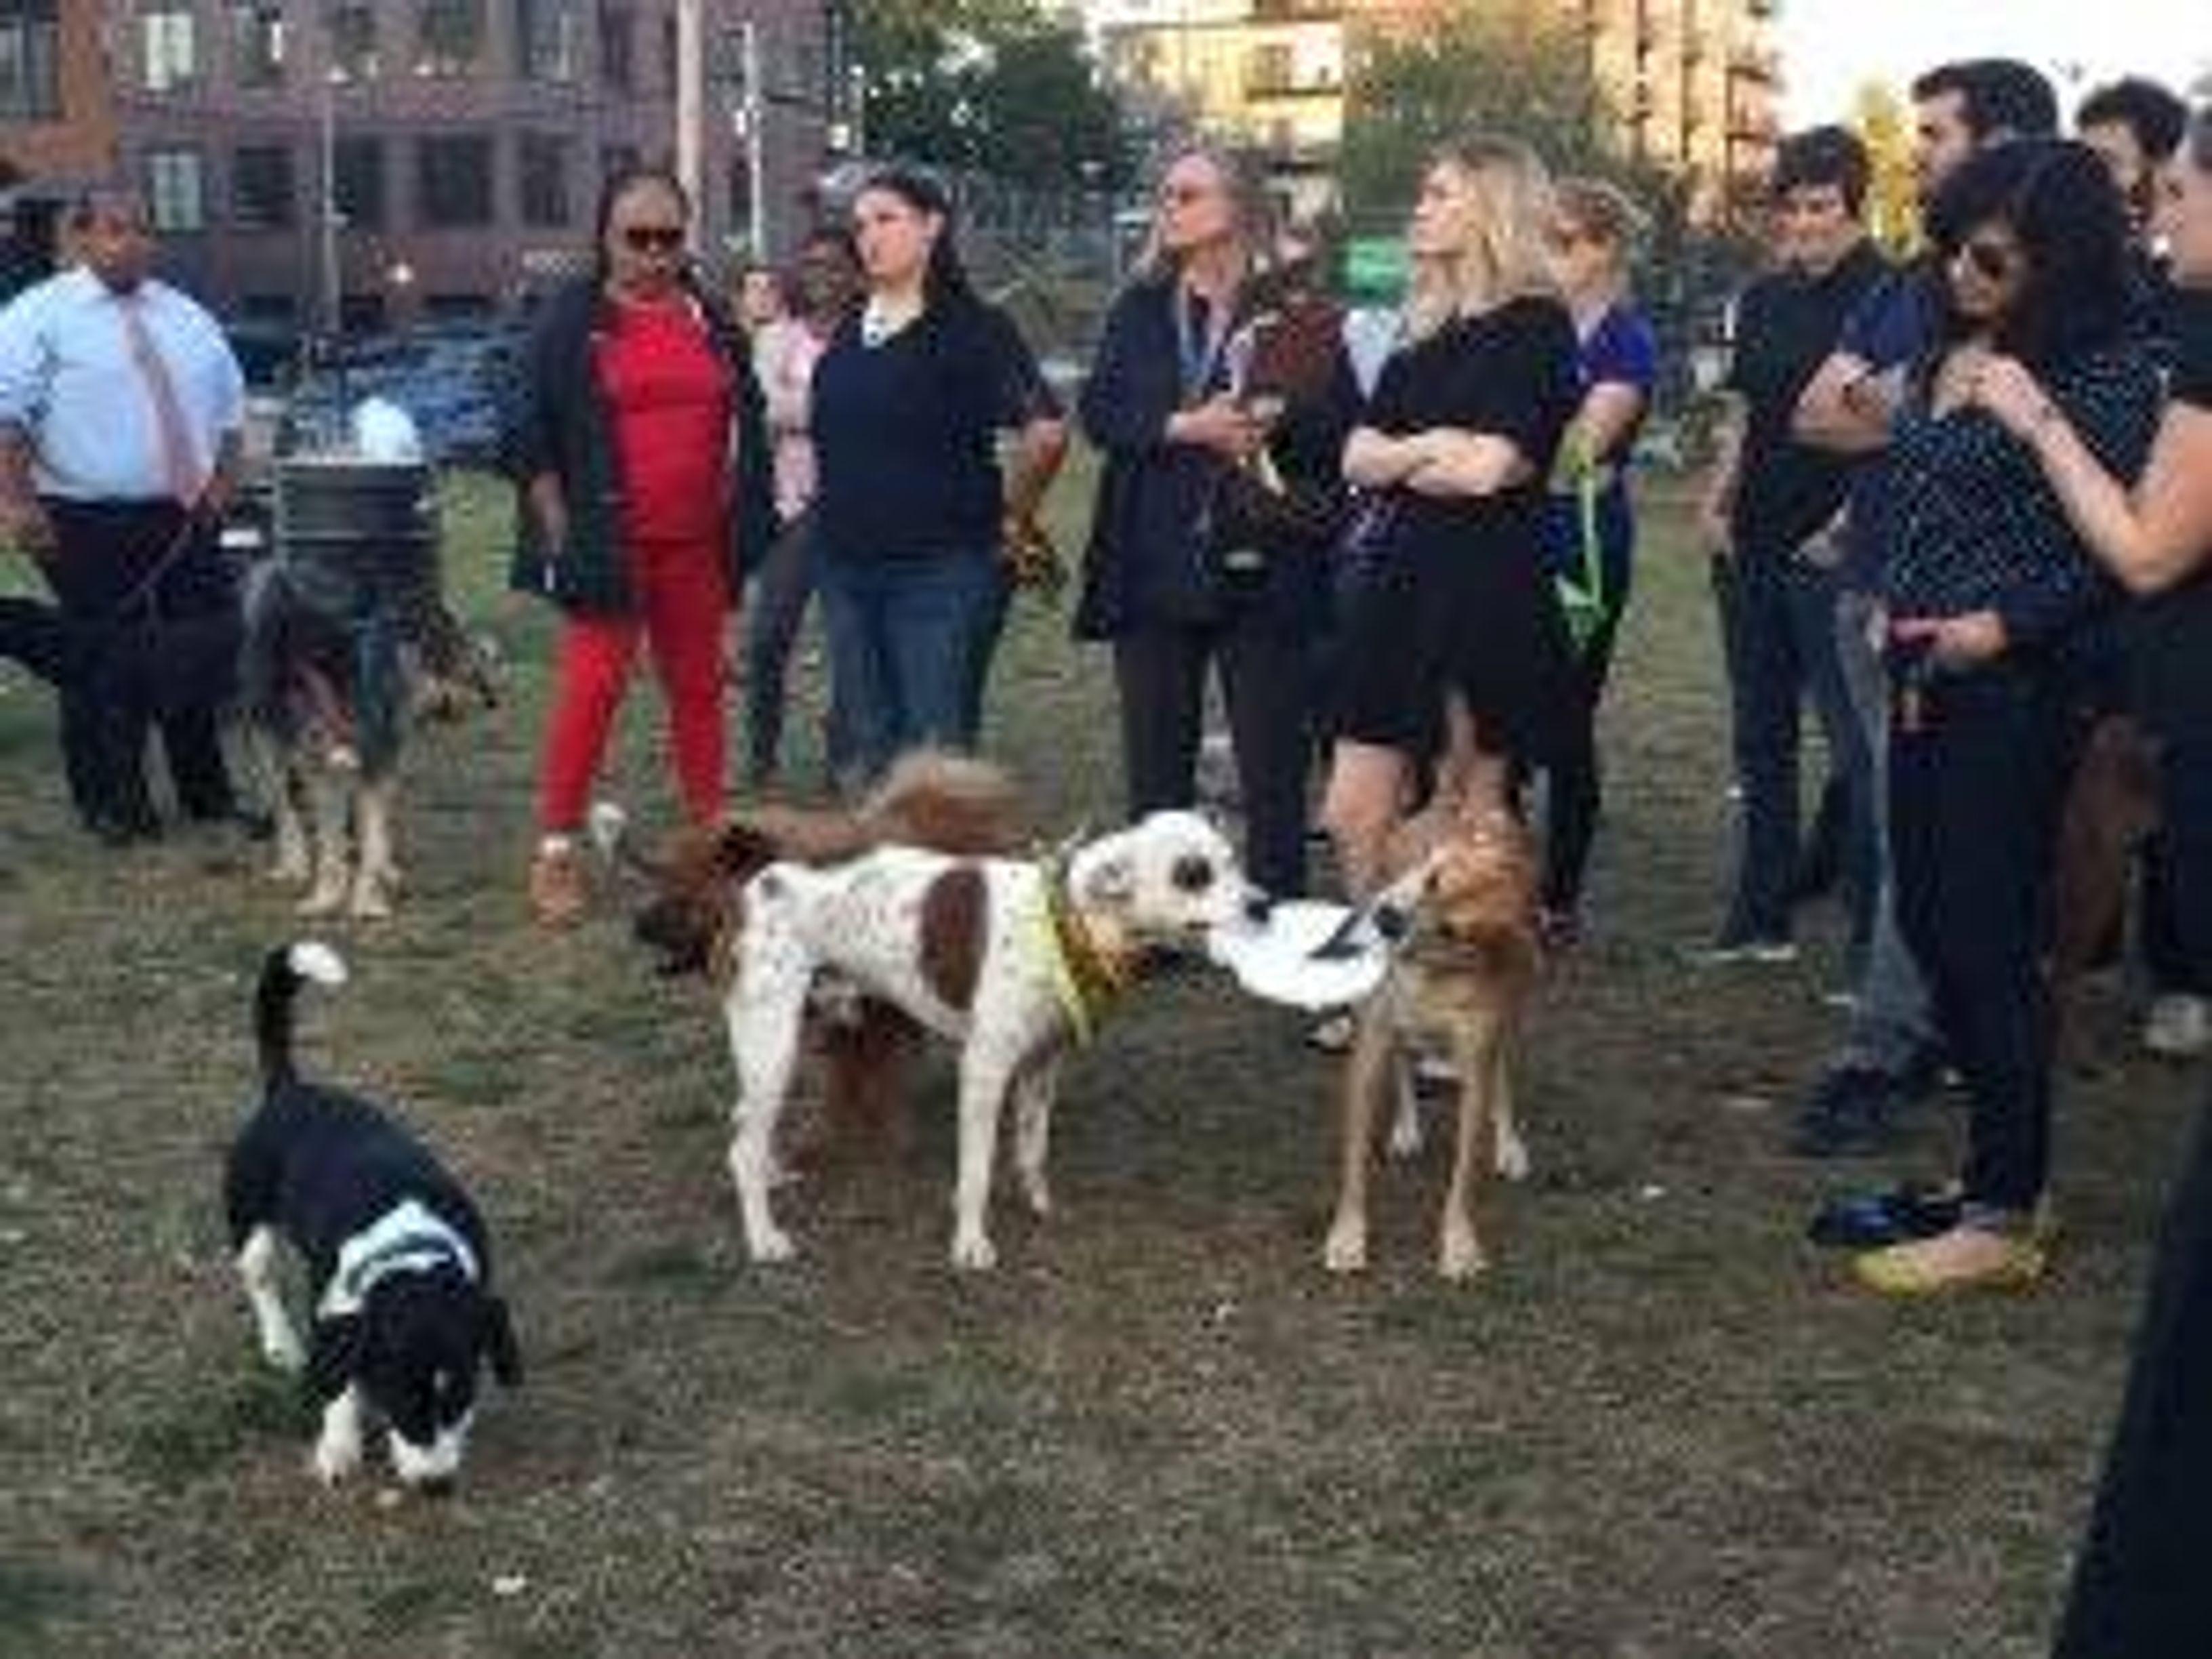 Visitors at the dog park